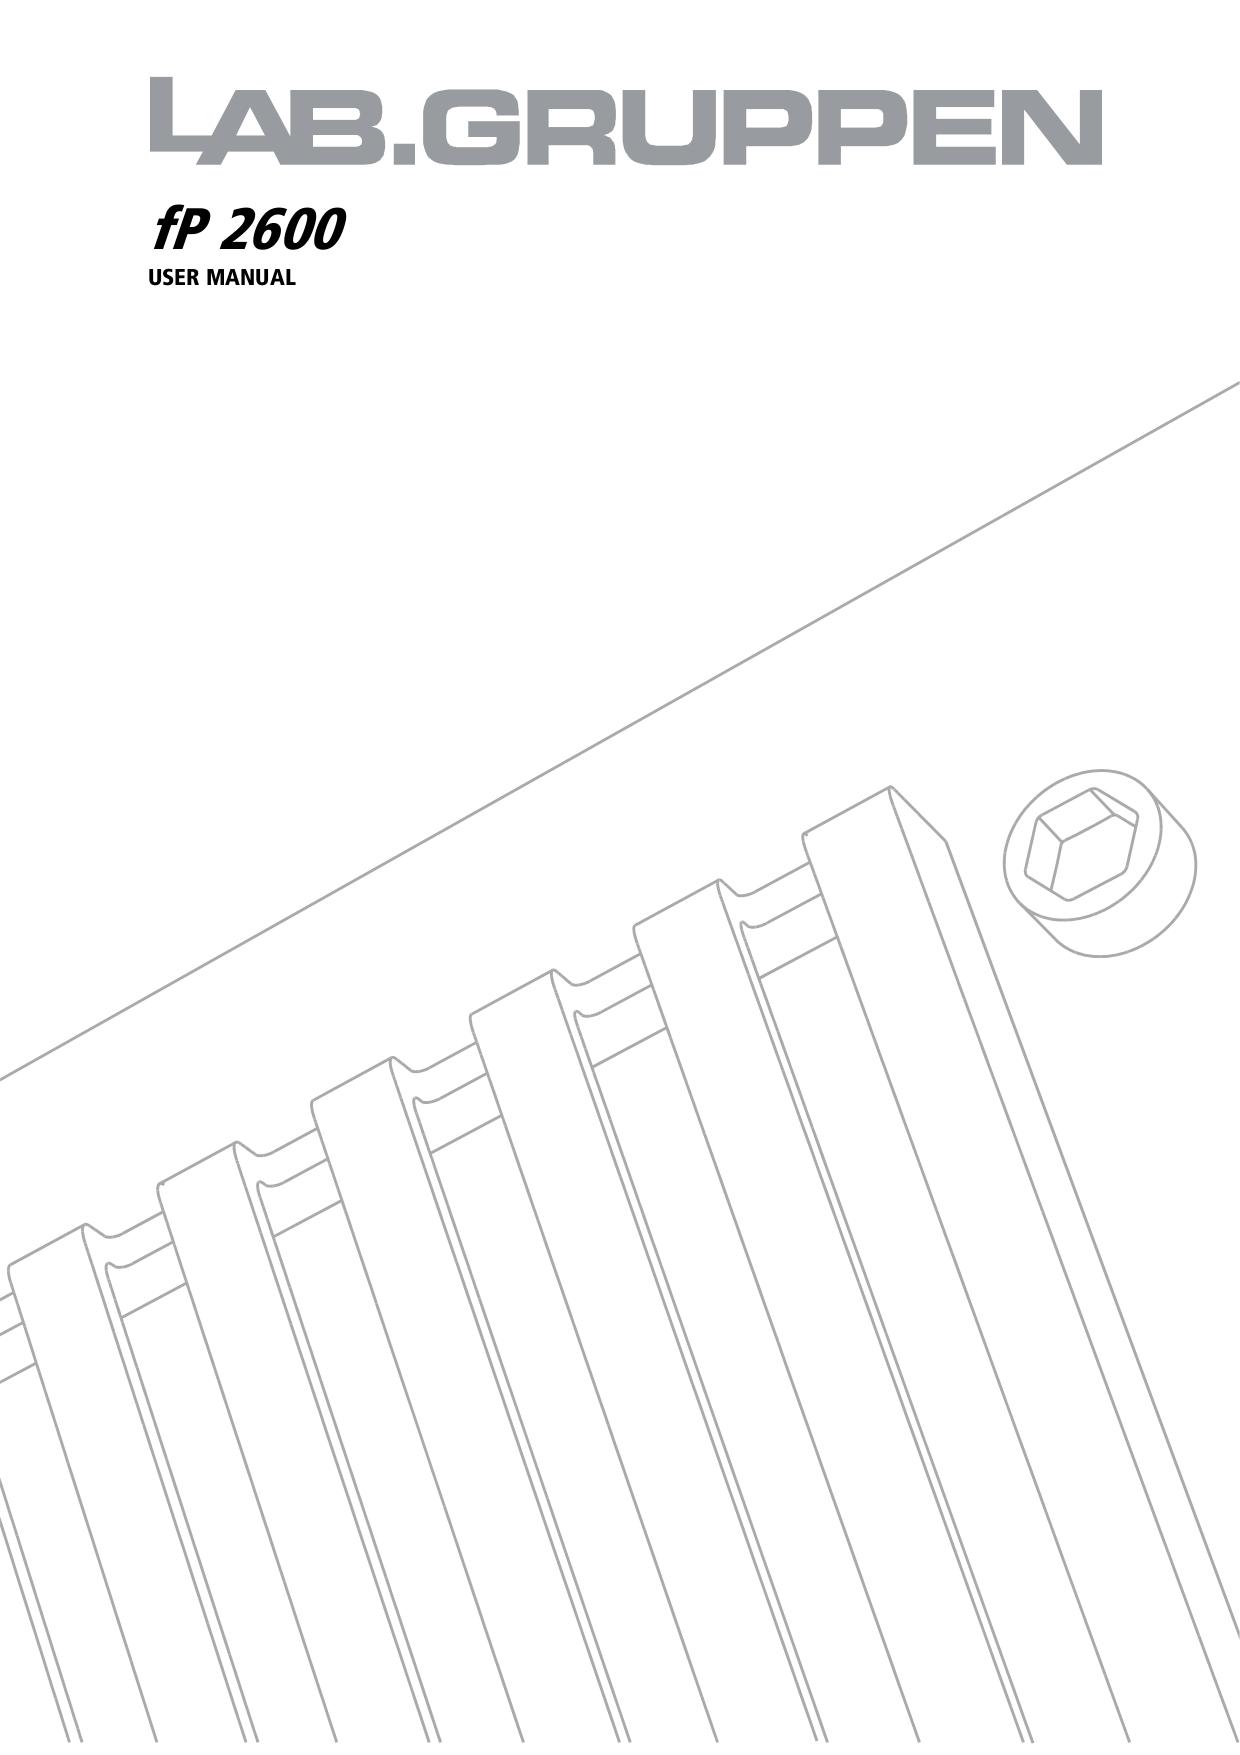 pdf for Lab.gruppen Amp fP Series FP 2600 manual